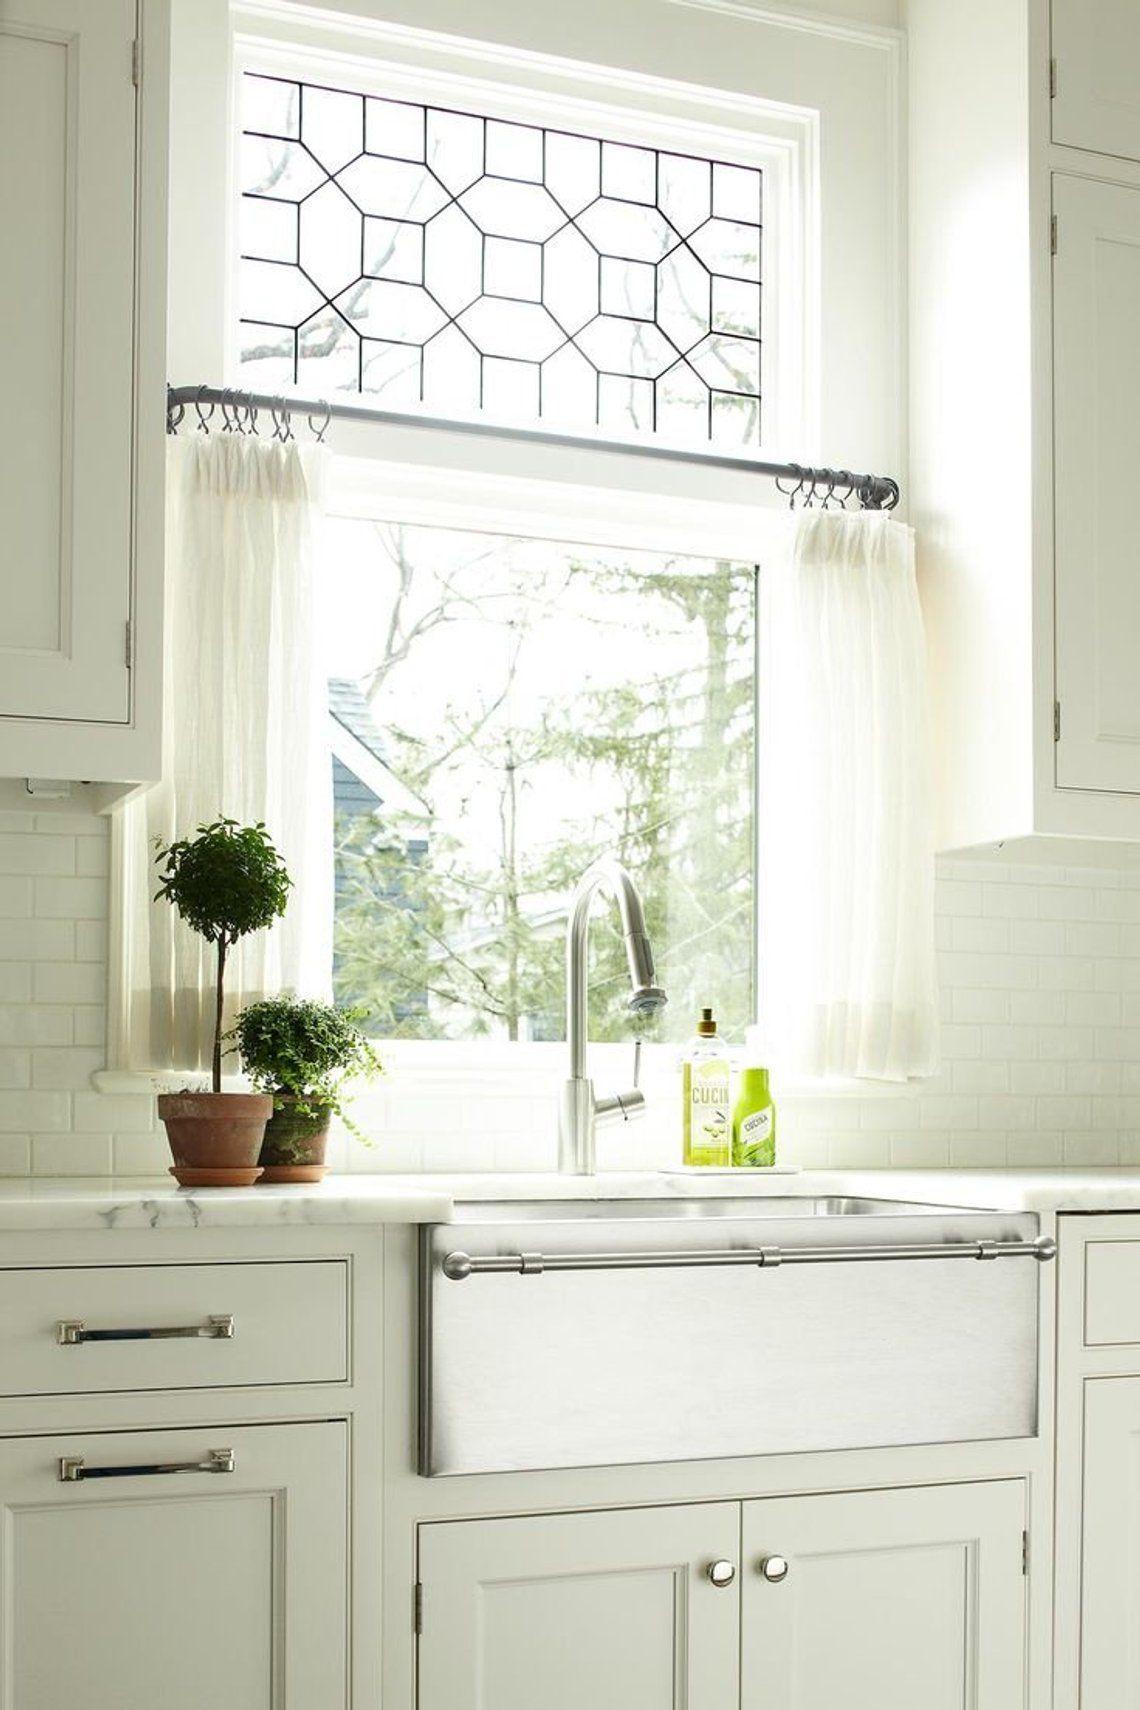 image 12 kitchenvalancelighting   Interior design kitchen, Kitchen ...